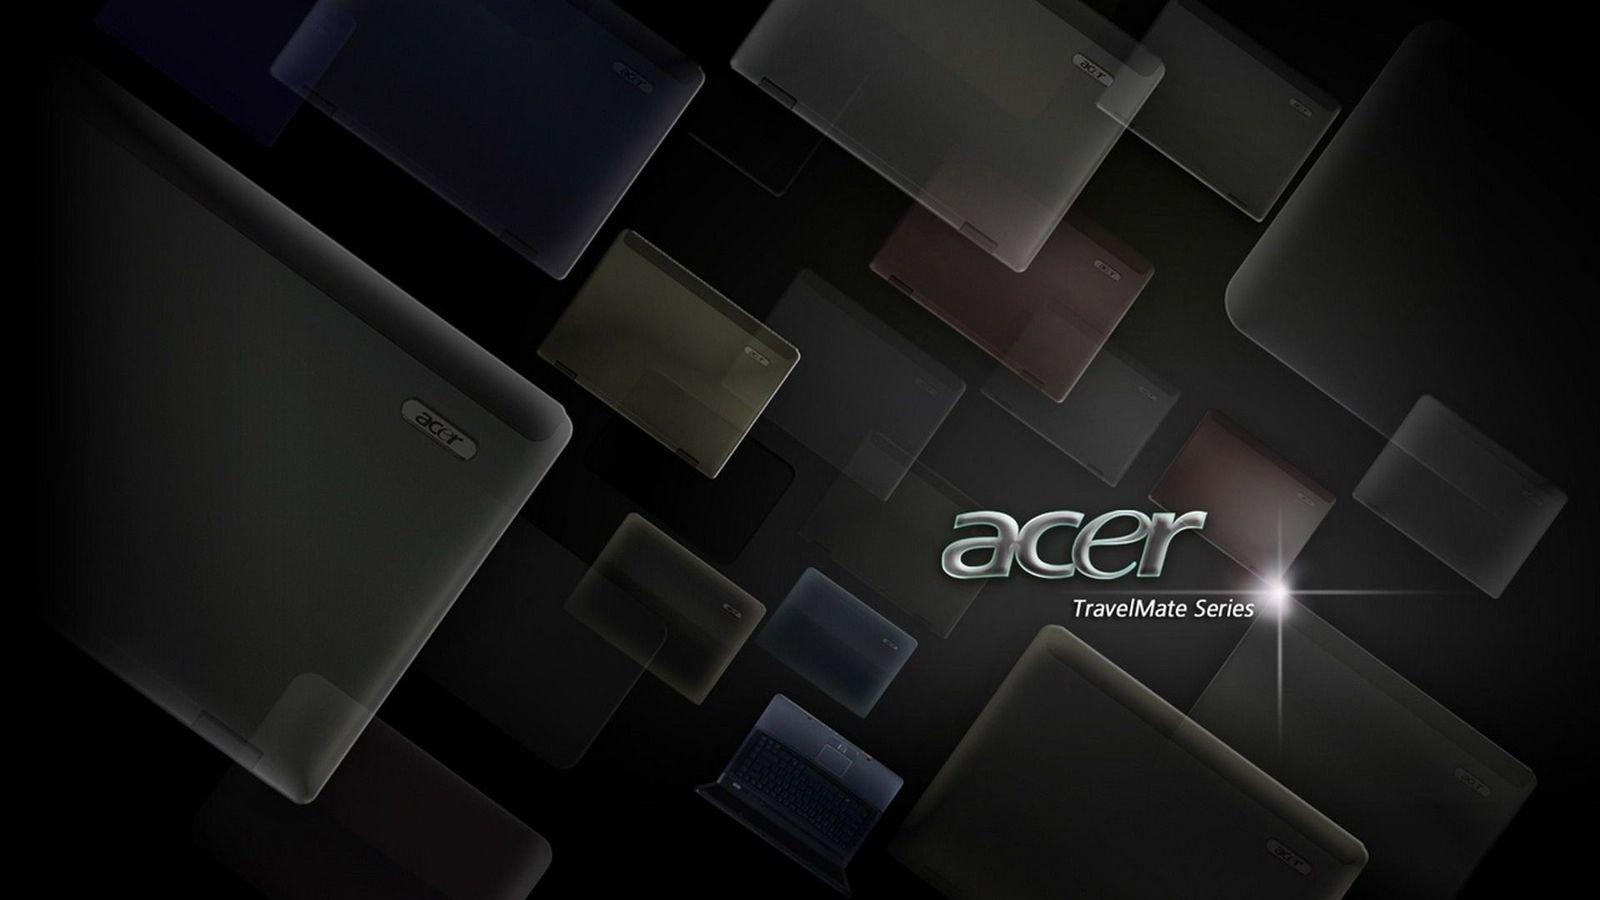 45 Acer Wallpaper 1600 By 900 On Wallpapersafari